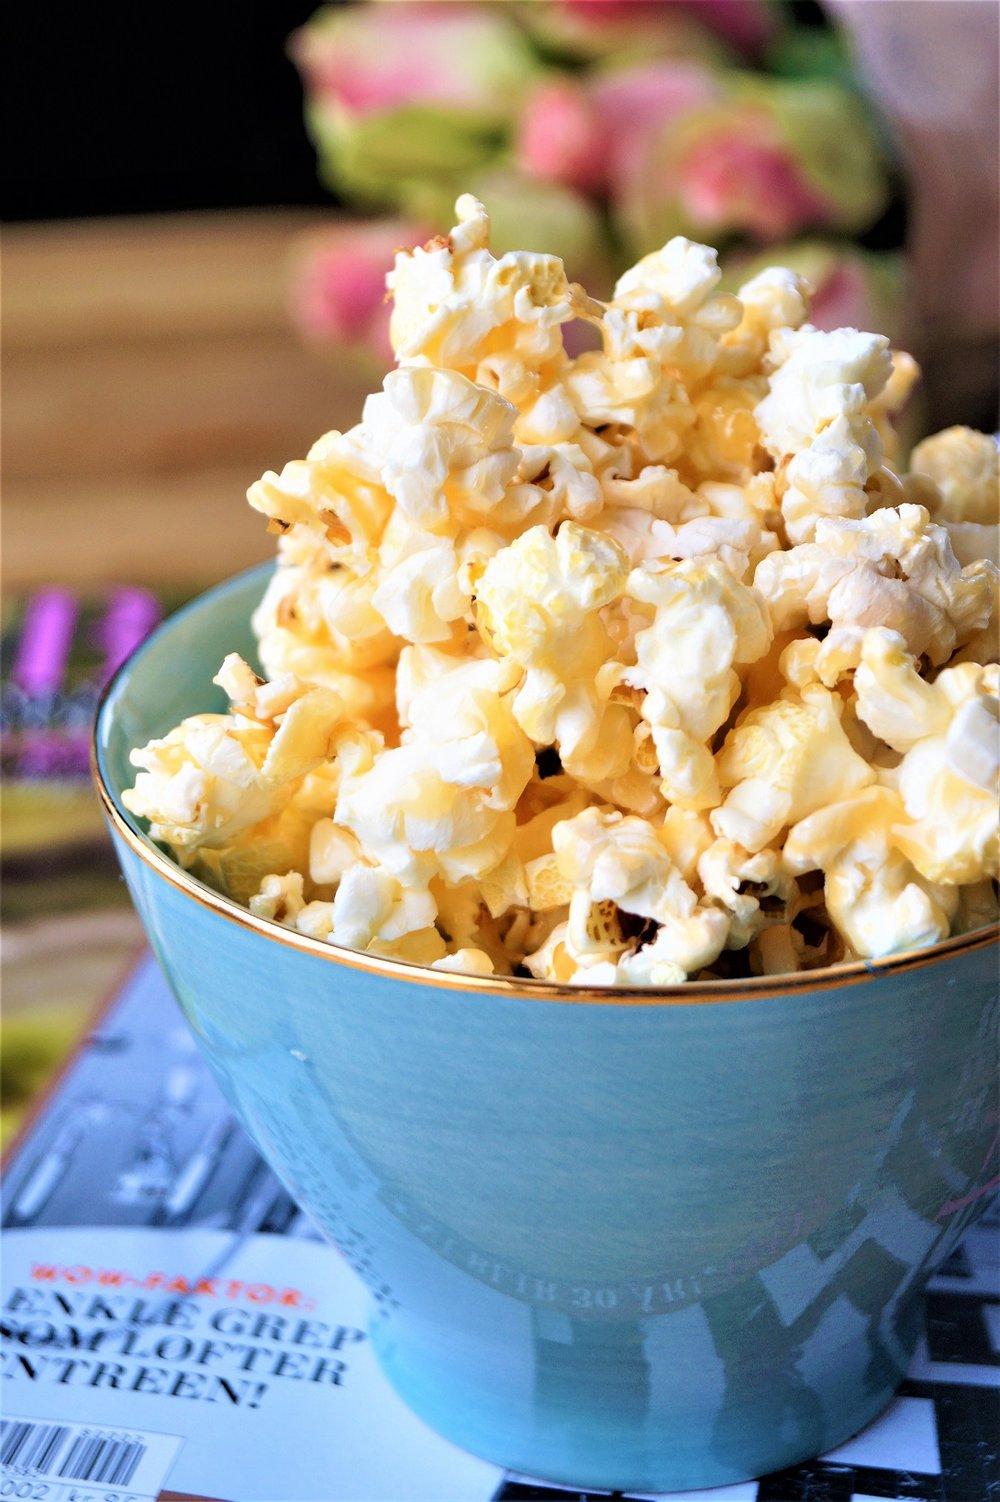 Popcorn men myk, salt karamell